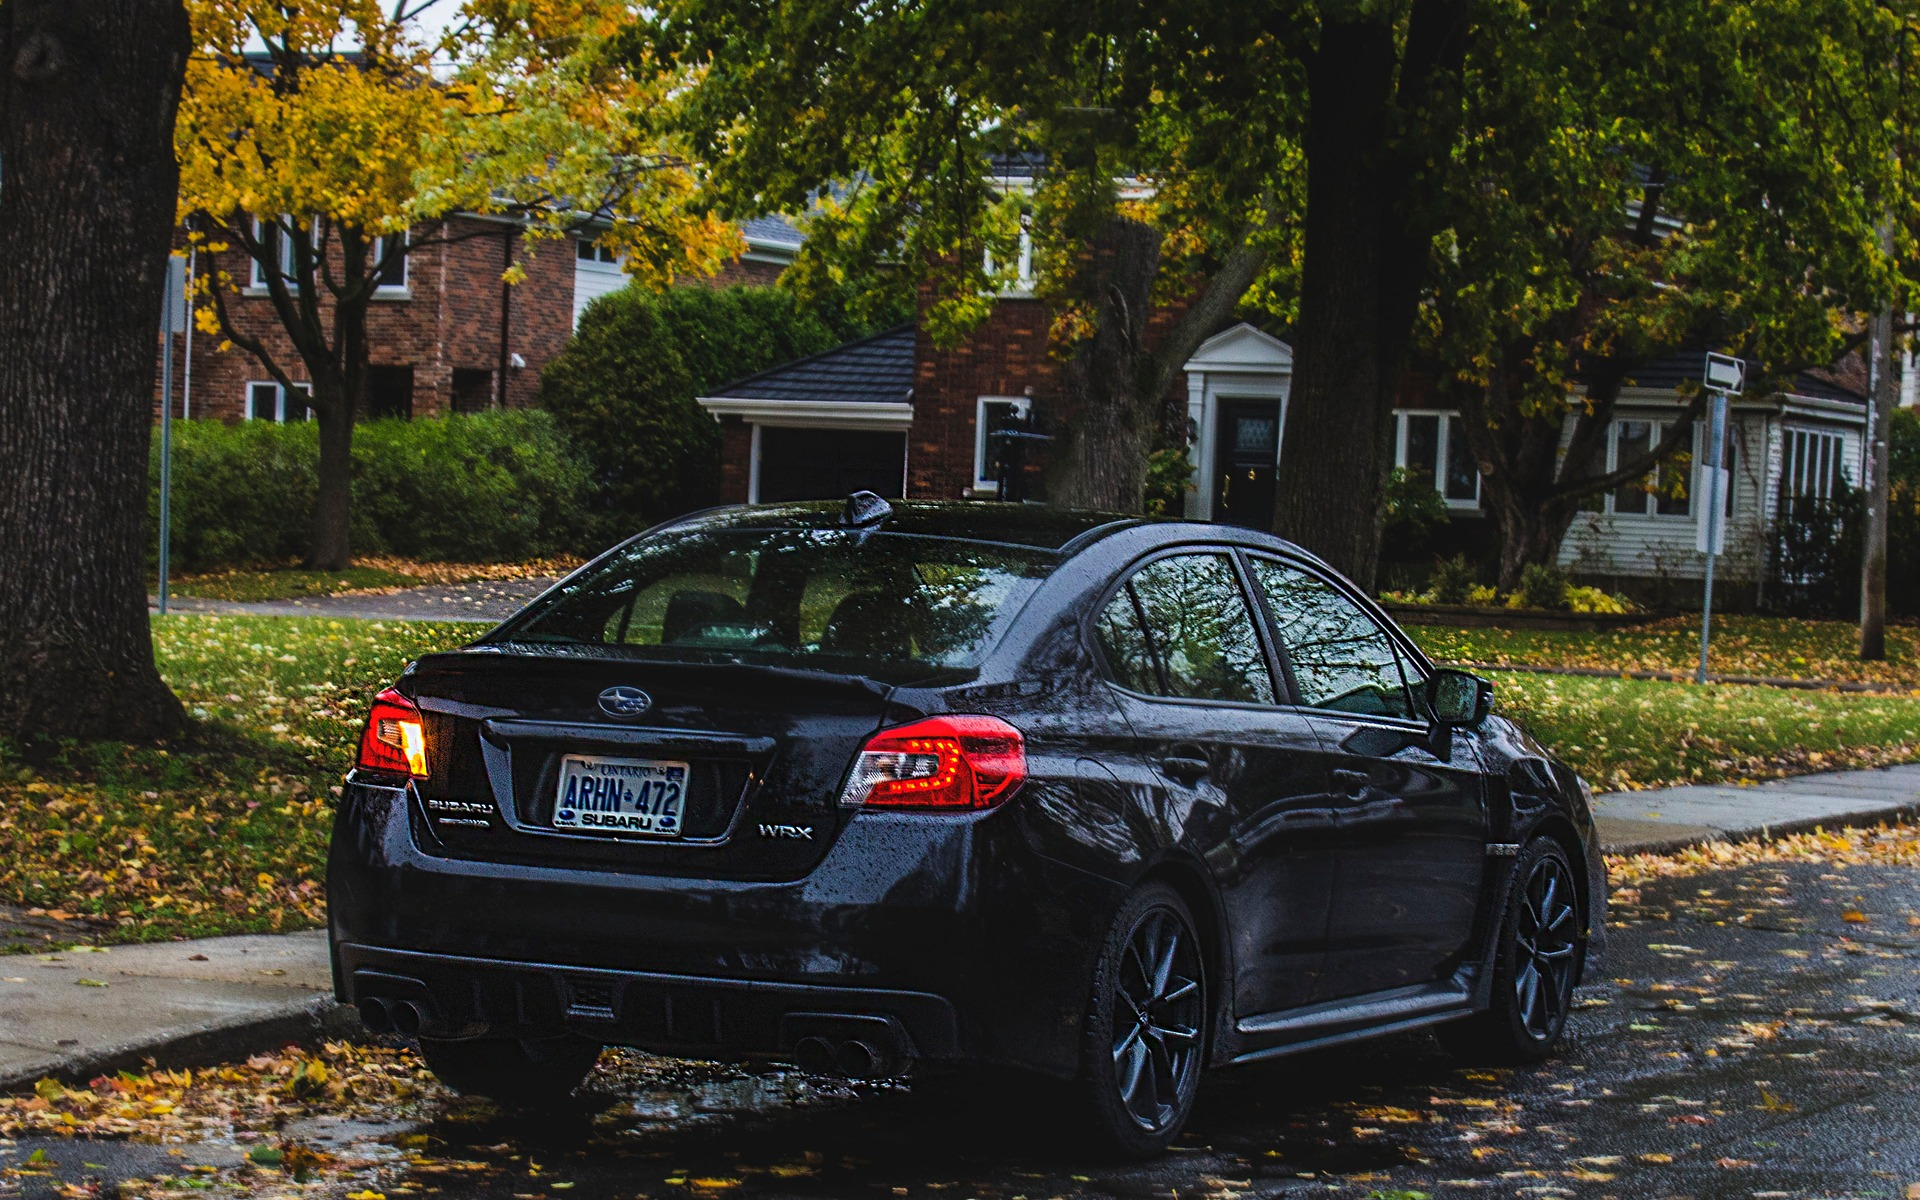 2018 Subaru WRX: With a CVT, it's Weird - The Car Guide